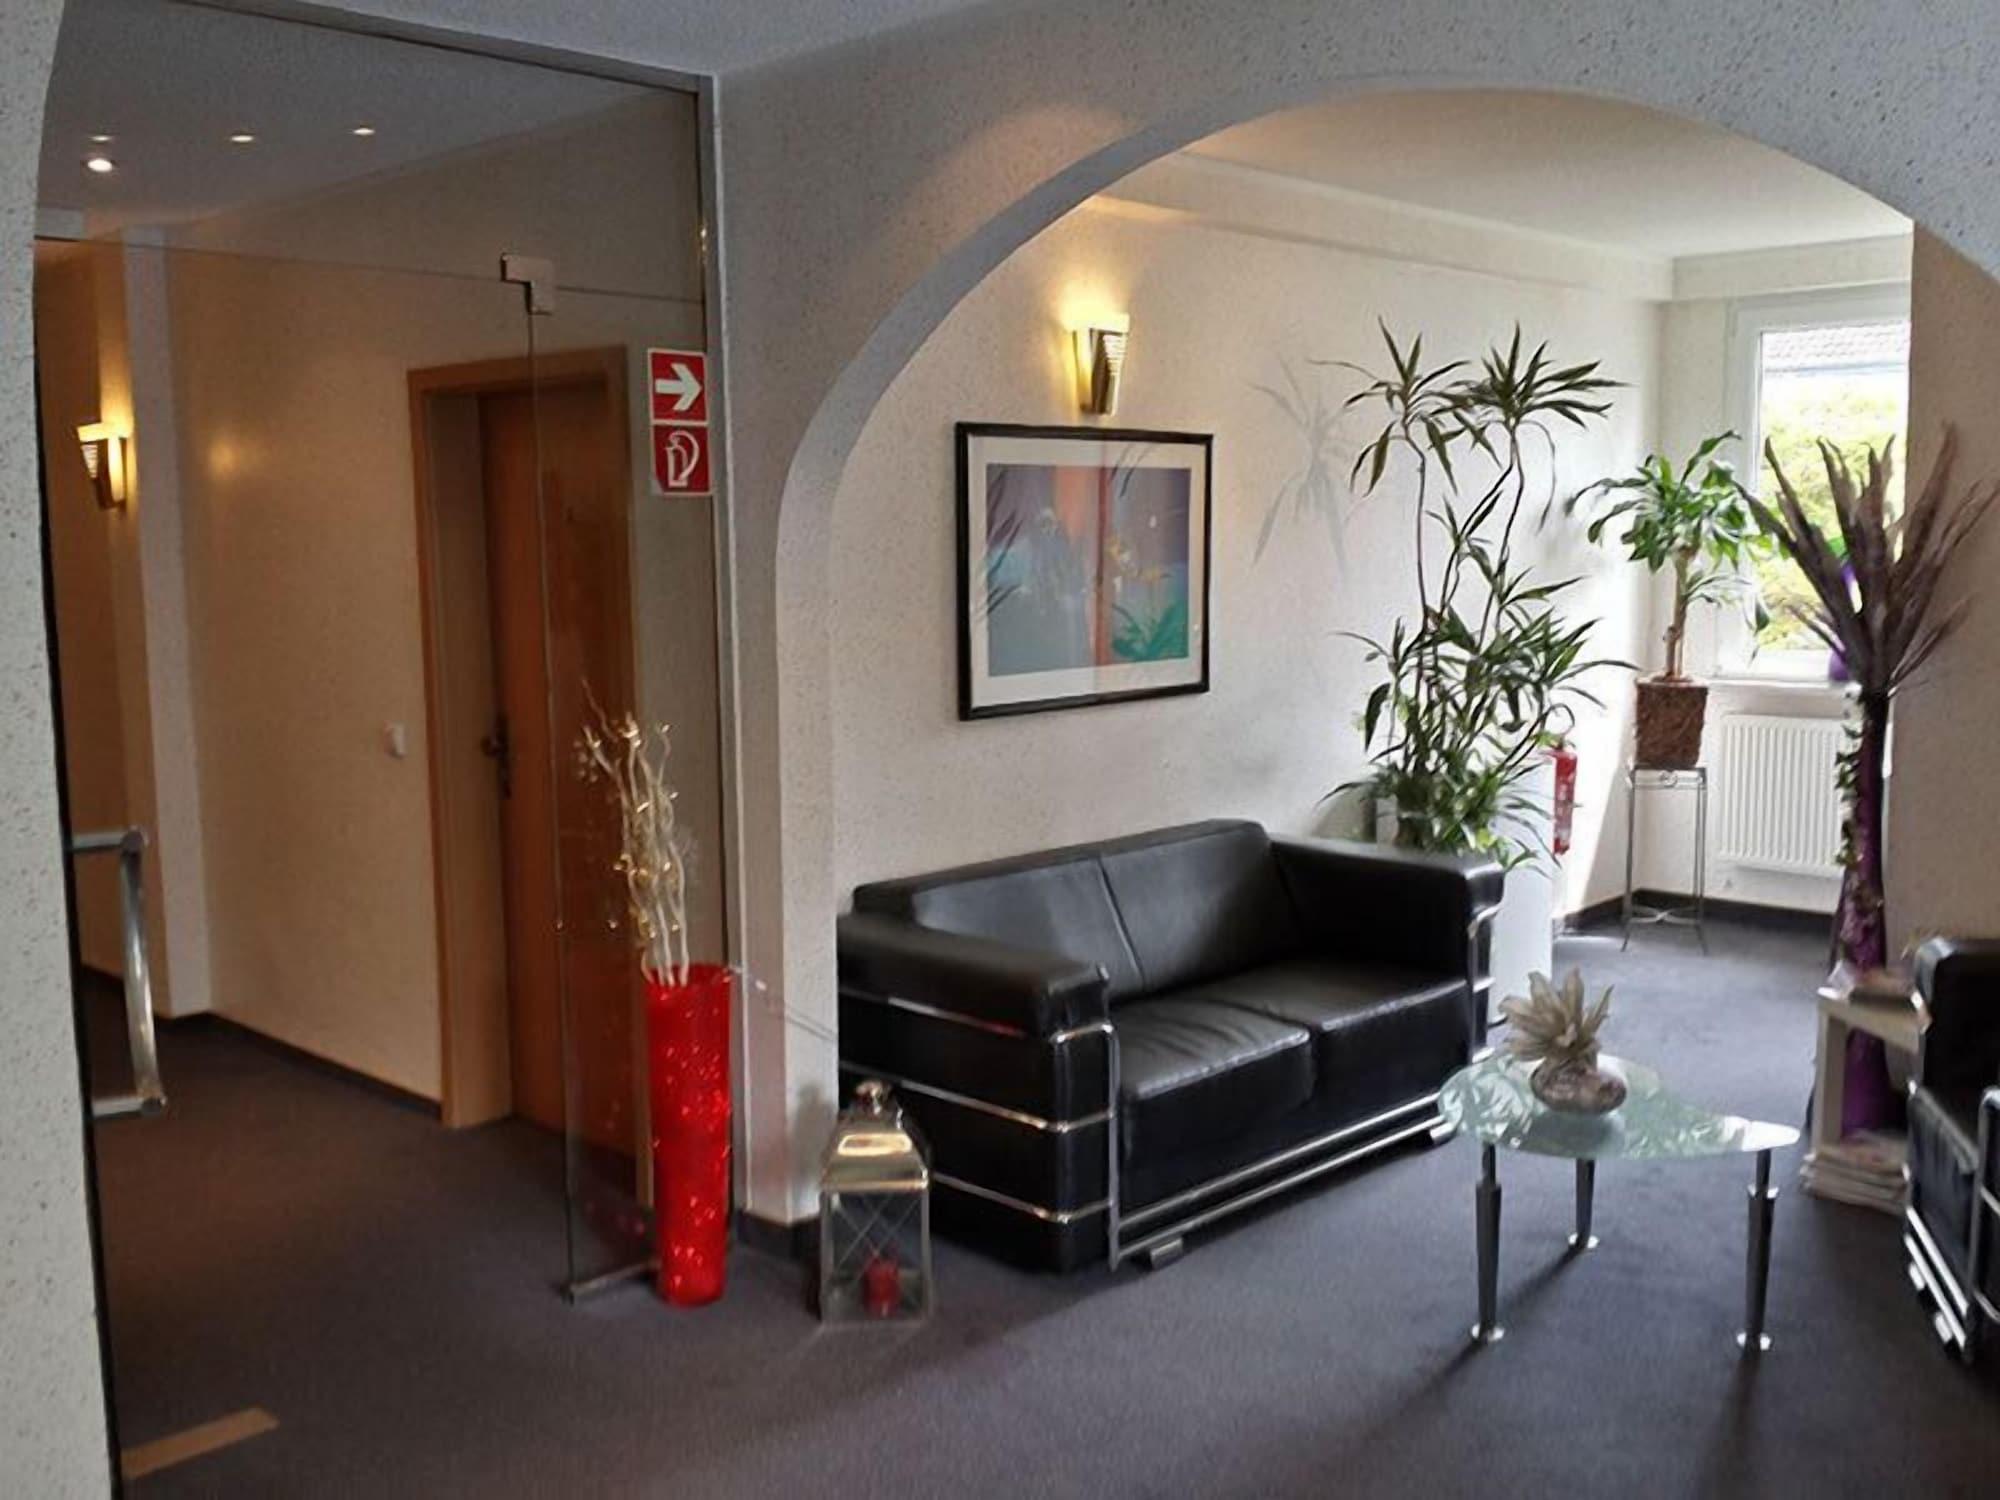 Hotel Merkur Garni, Hildesheim